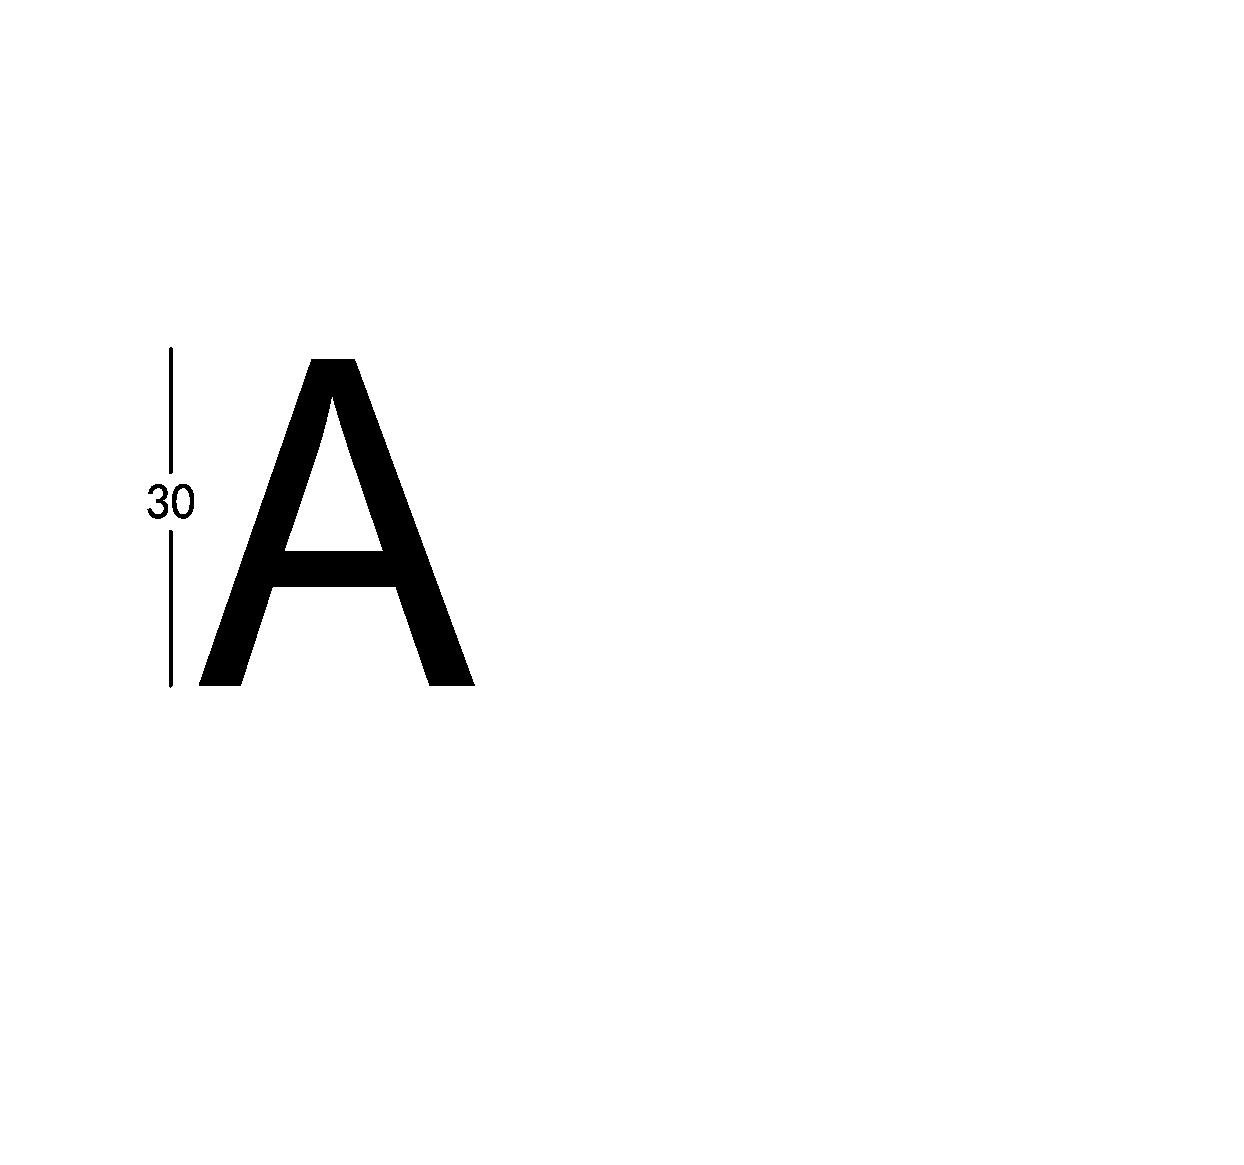 Carattere rit. h30cm/s2.5mm